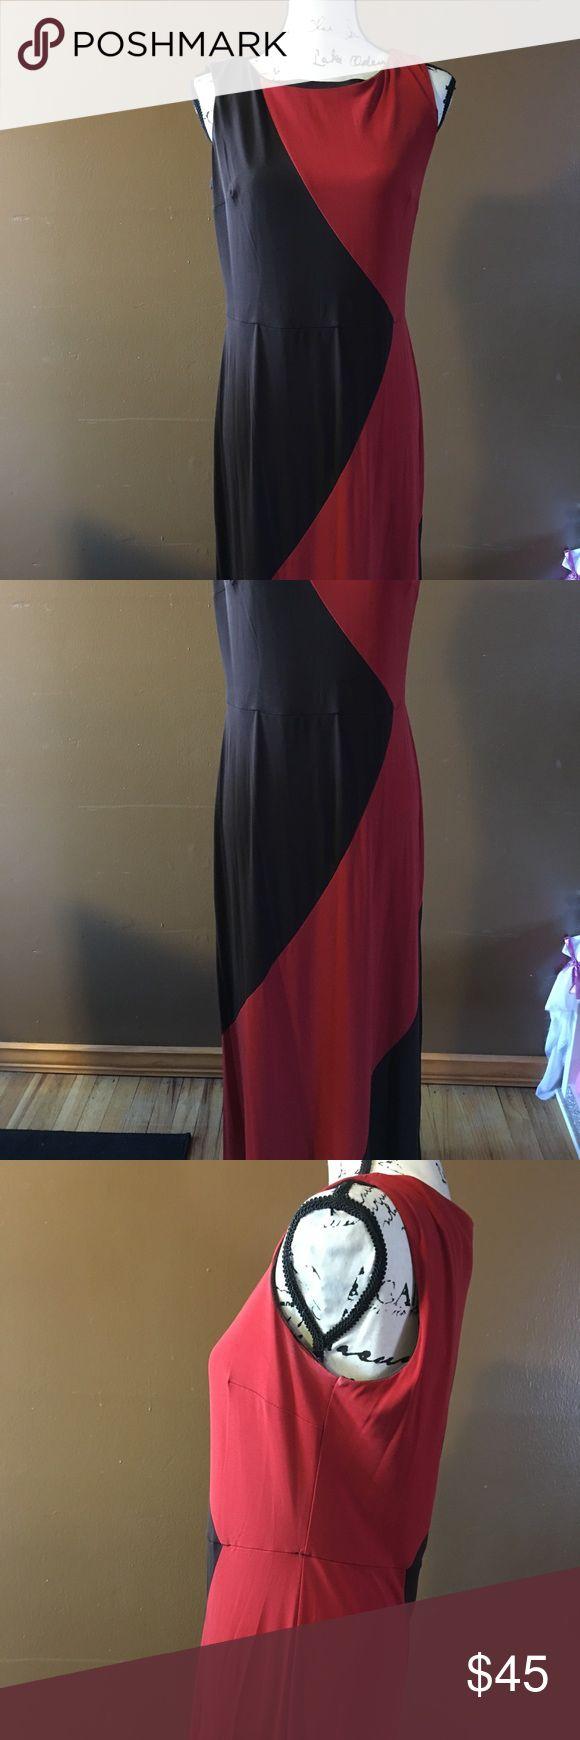 SANDRA DARREN EXTRA LONG MAXI DRESS Size 8 sandra darren Dresses Maxi